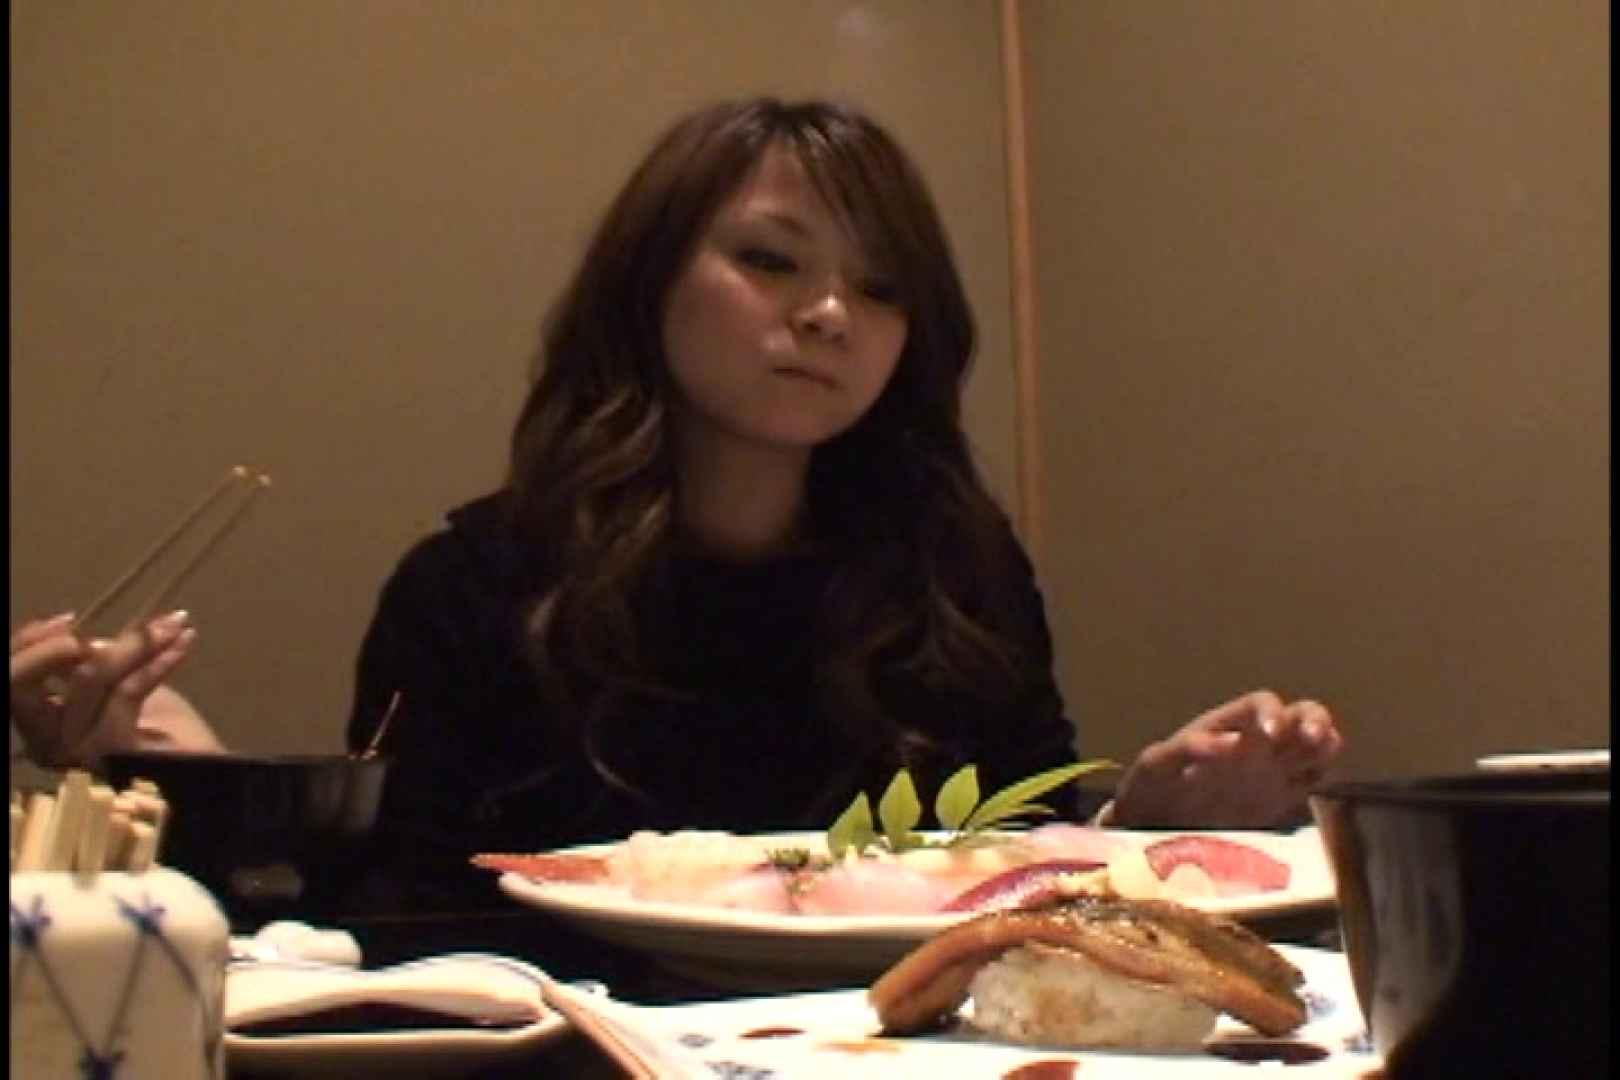 JDハンター全国ツアー vol.009 後編 女子大生のエロ動画  112PIX 36